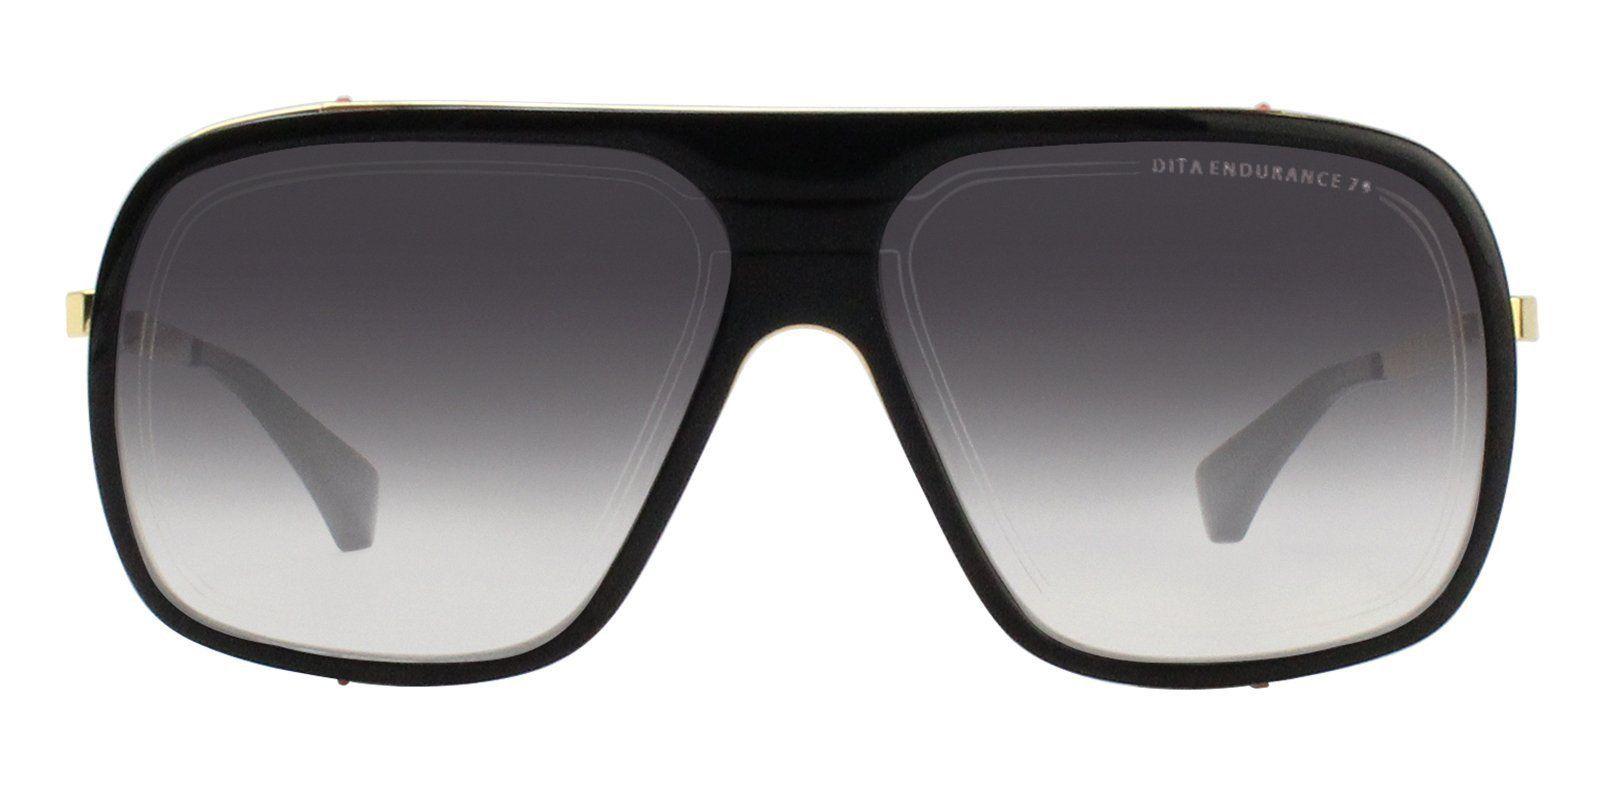 6fd479f99ab Dita - ENDURANCE 79 Black Gold - Dark Grey to Clear sunglasses ...